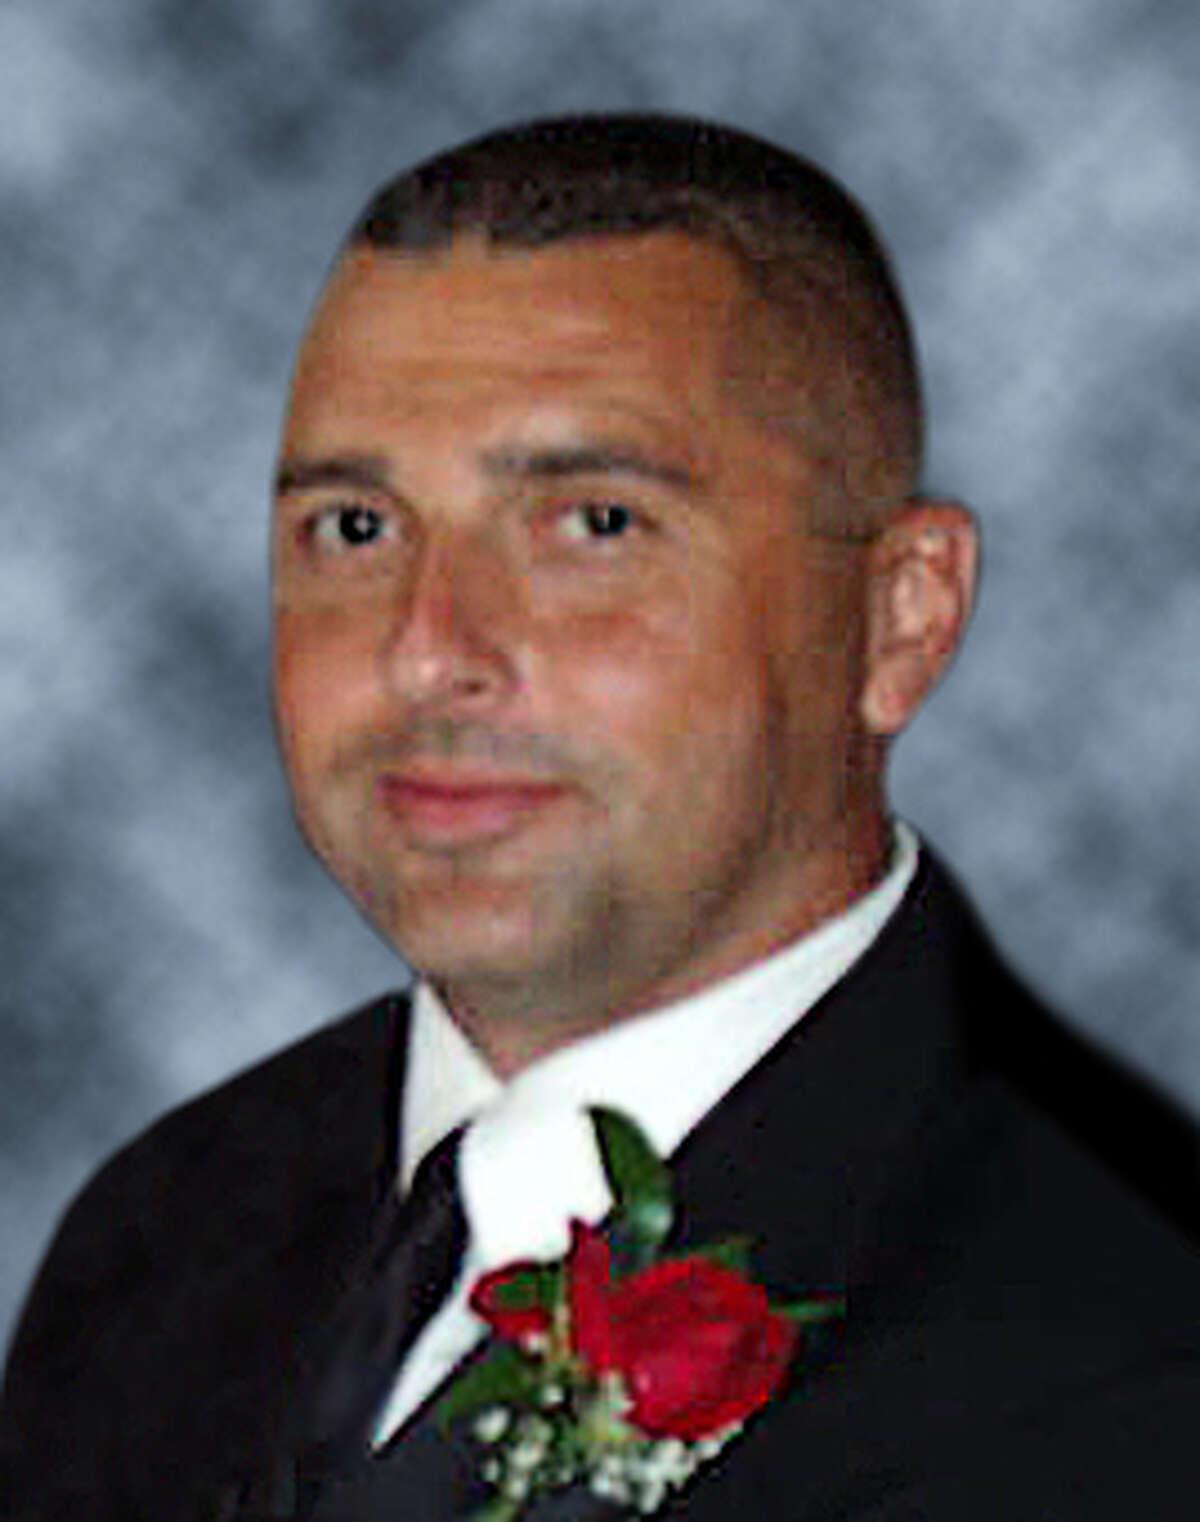 Bridgeport Fire Department Lt. Steven Velazquez.